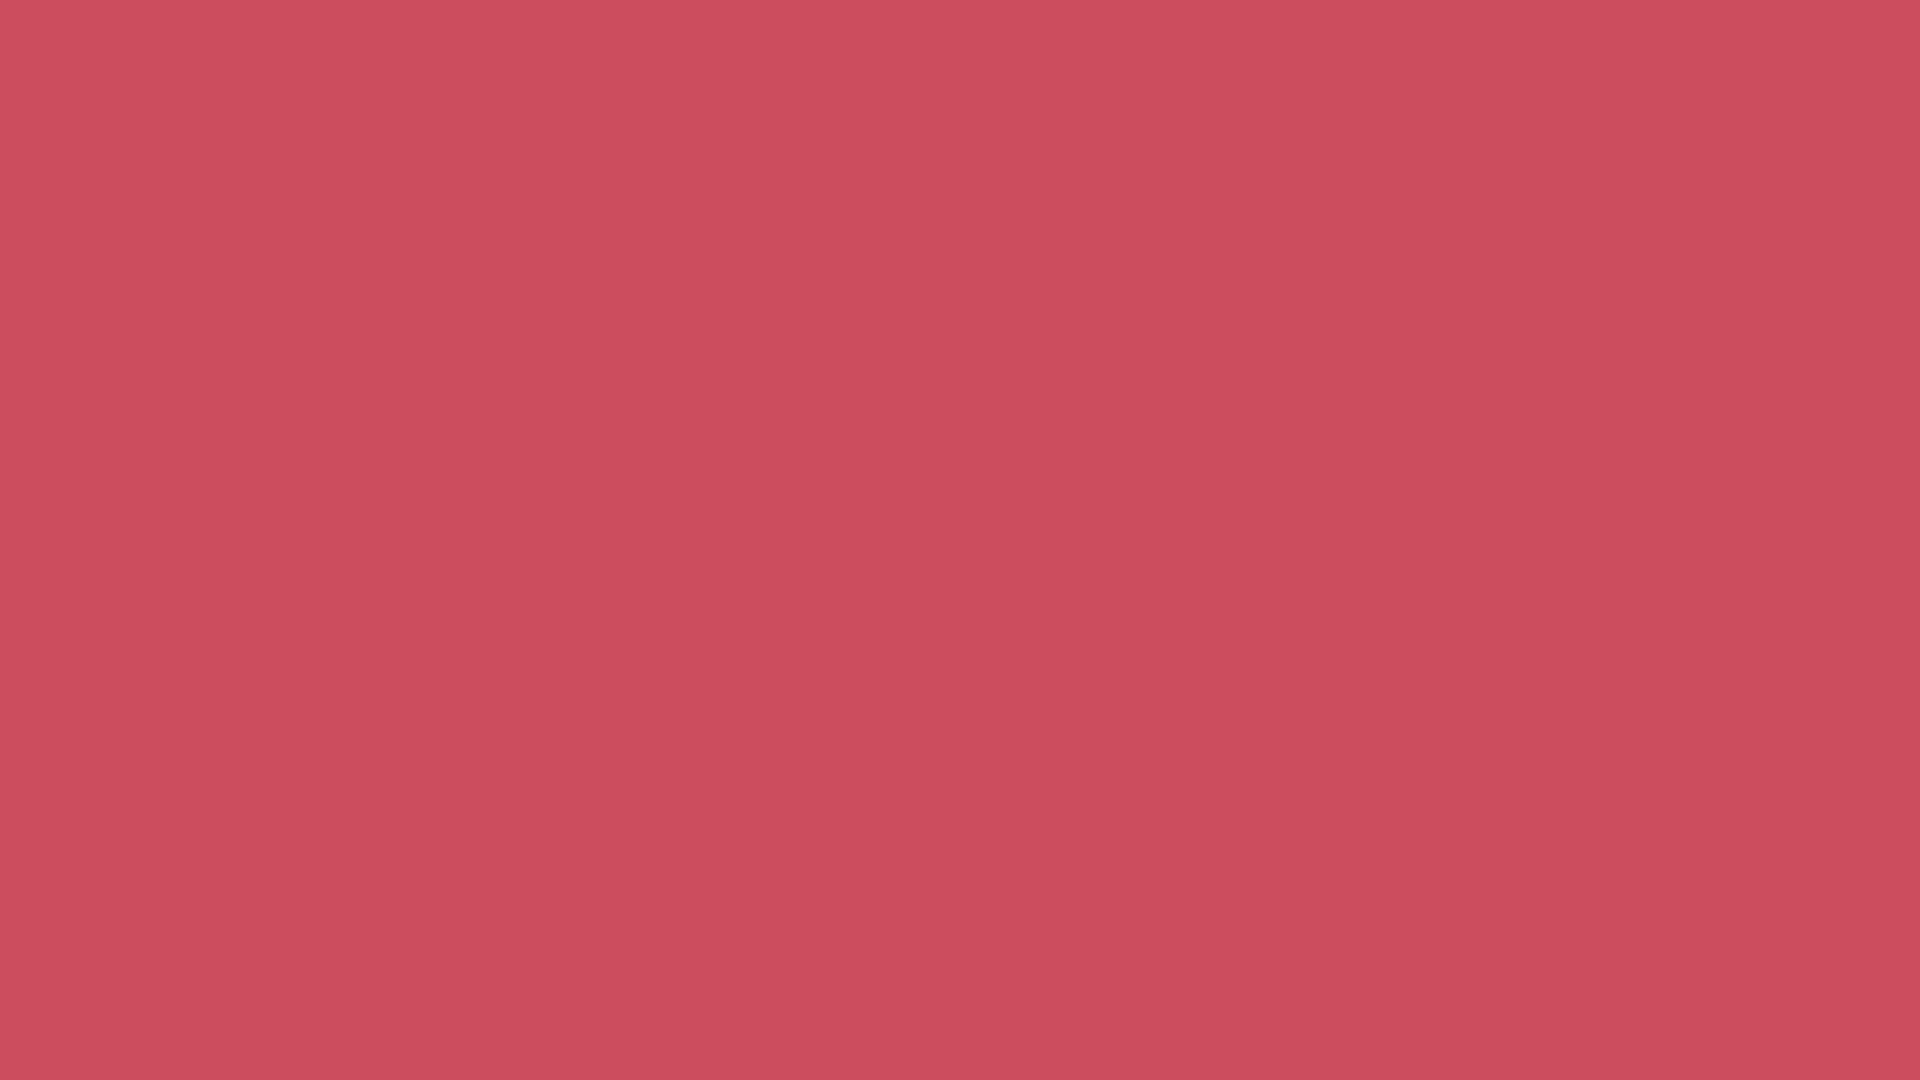 1920x1080 Dark Terra Cotta Solid Color Background